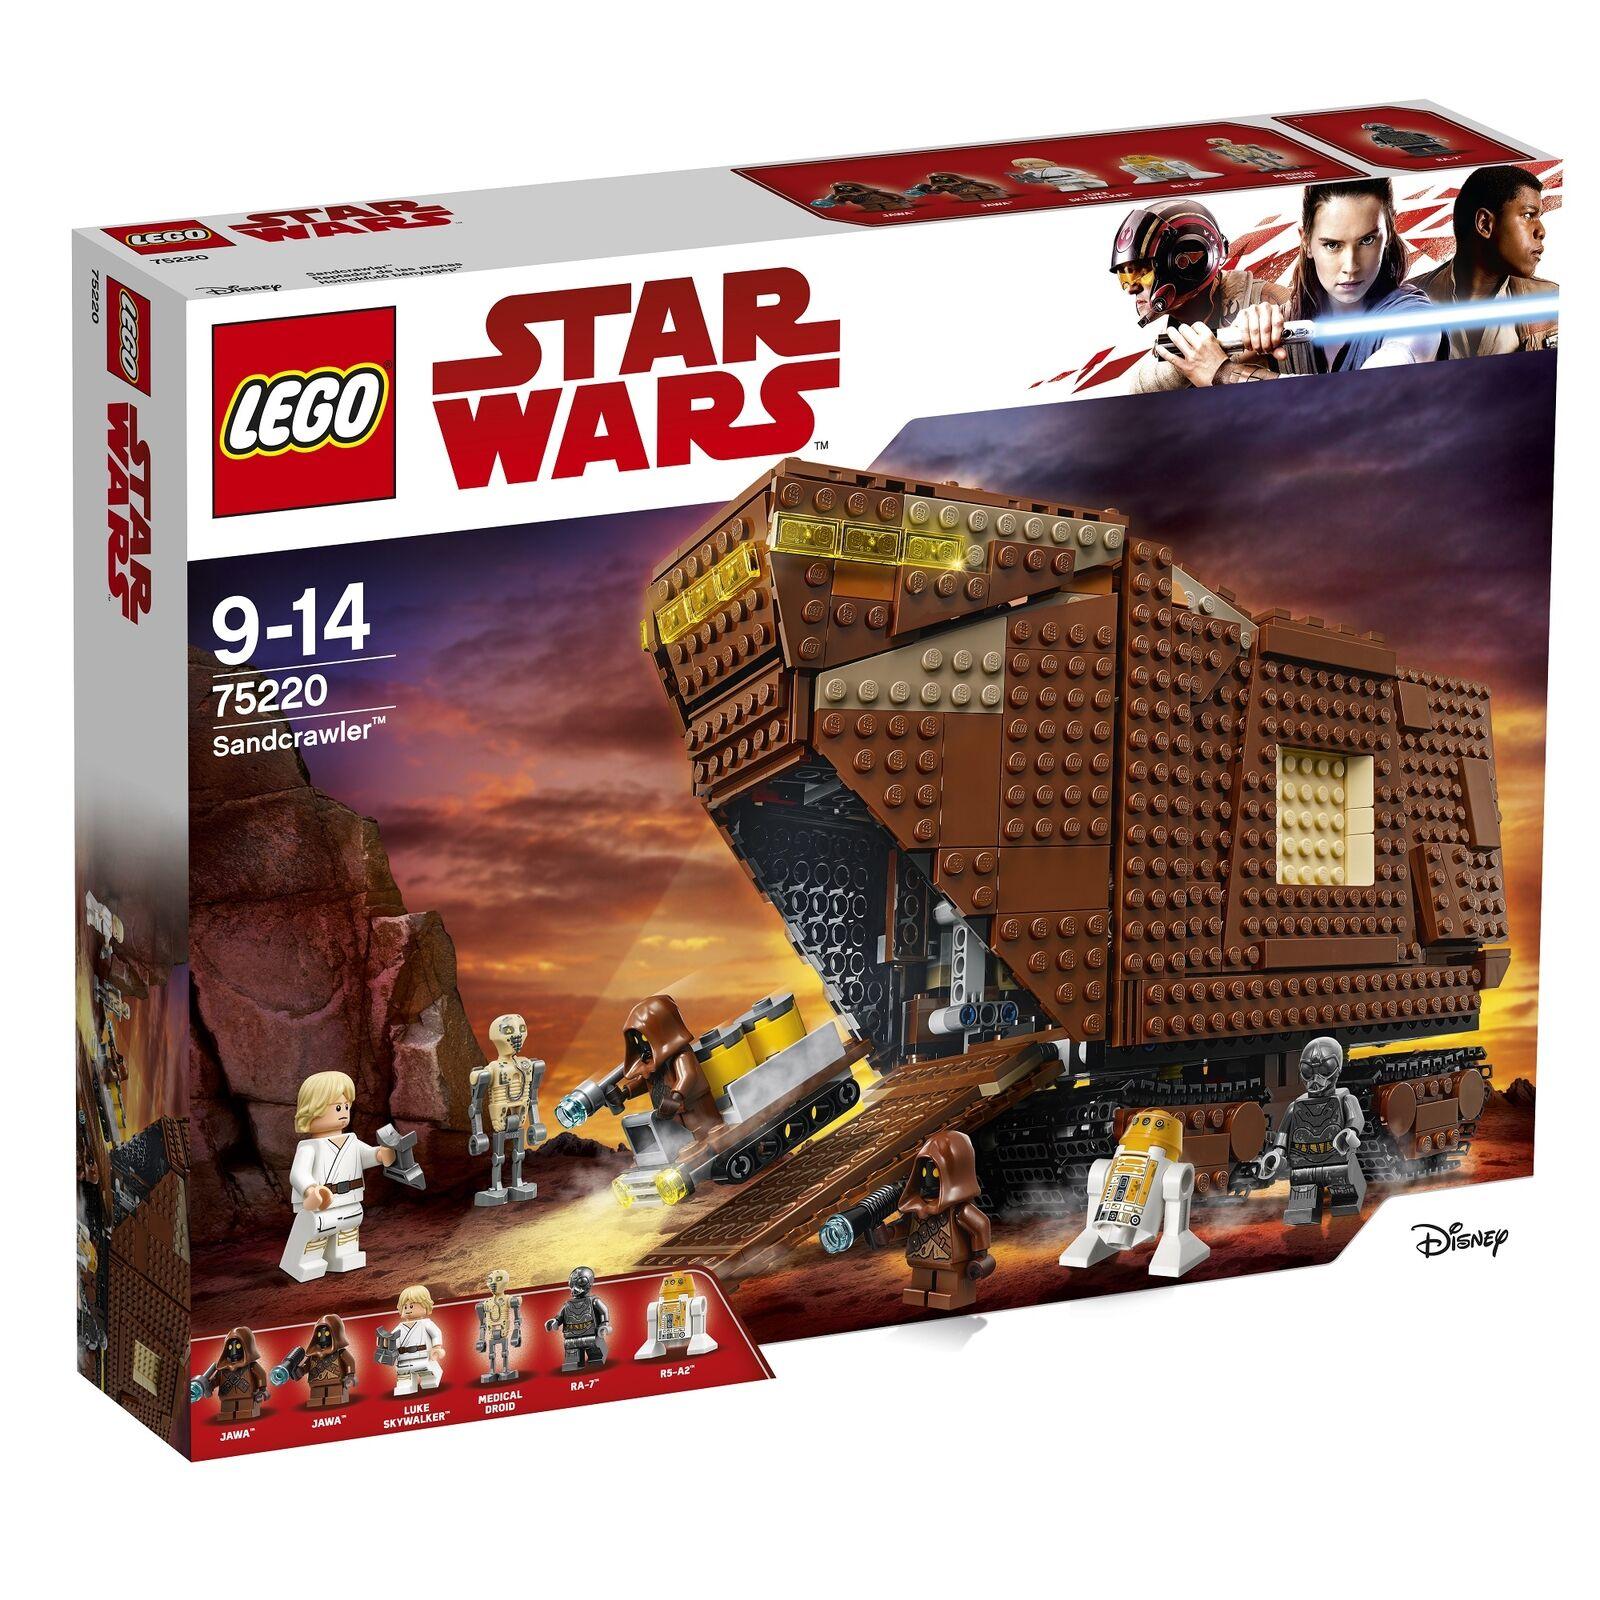 LEGO Star Wars Sandcrawler - 75220 - BRAND NEW